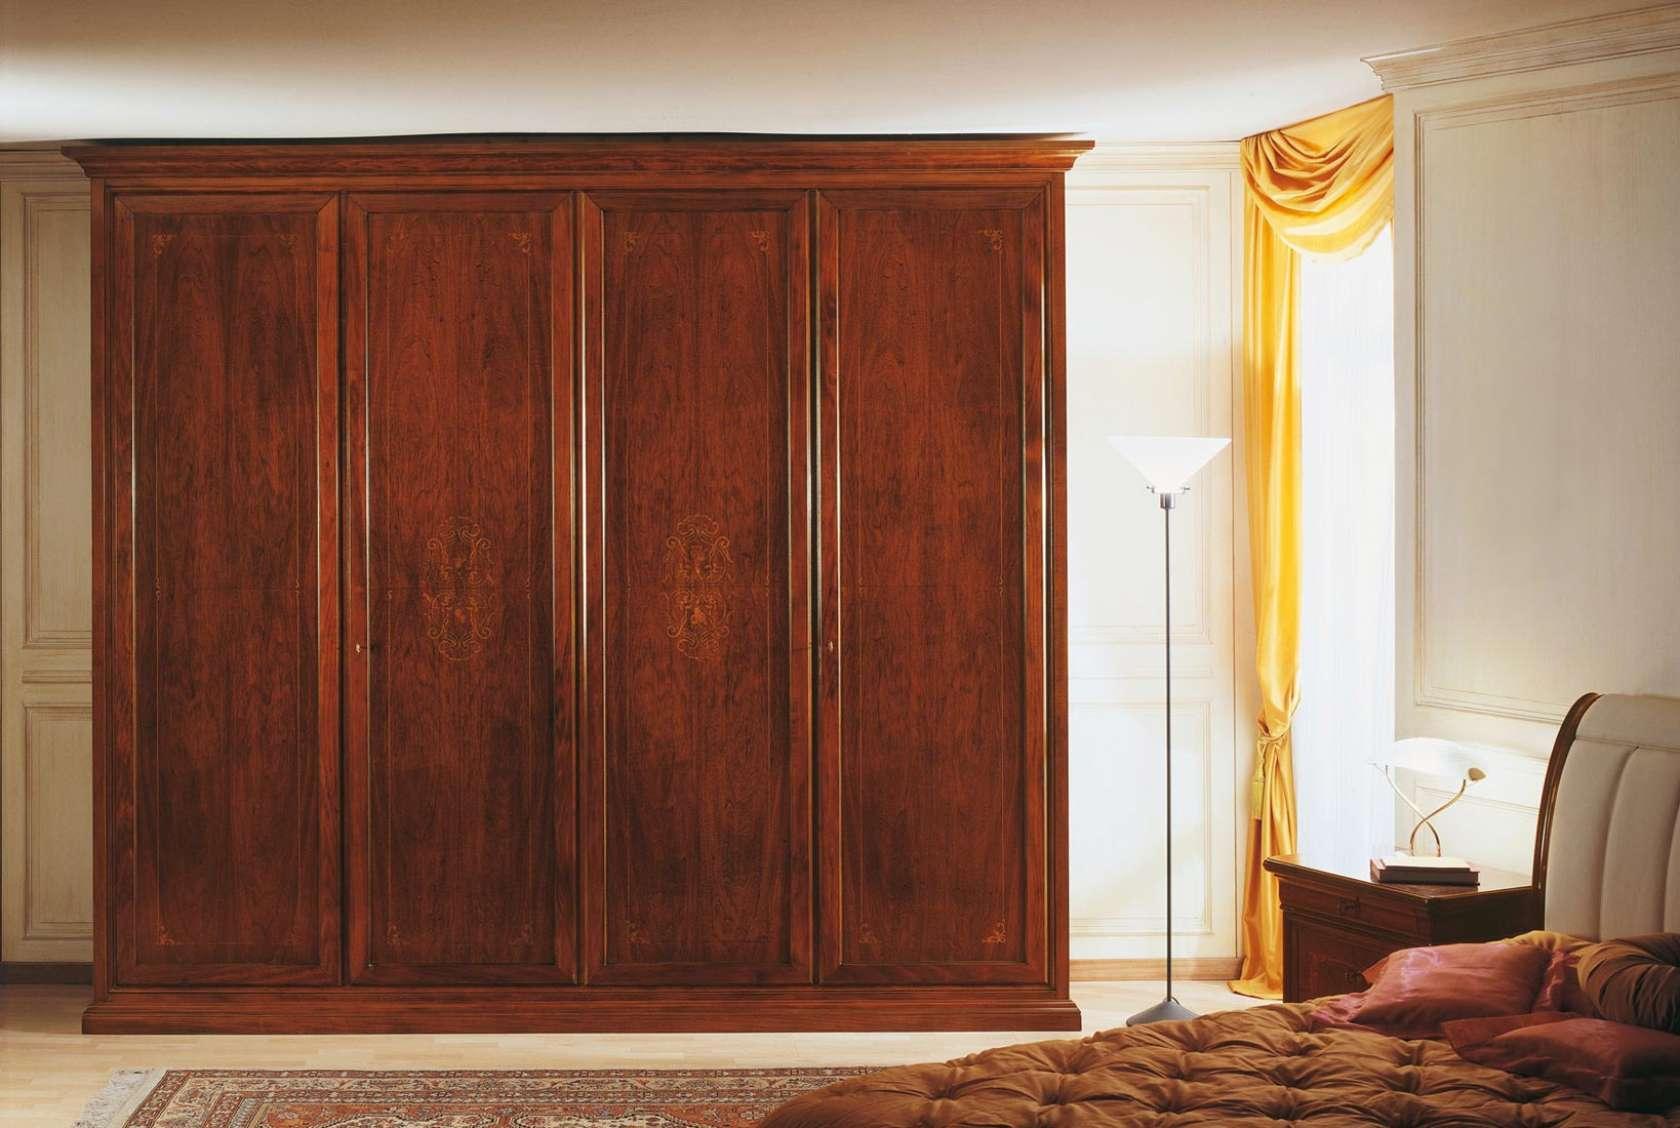 Camera da letto 800 francese armadio due vani intarsiato - Camera da letto francese ...